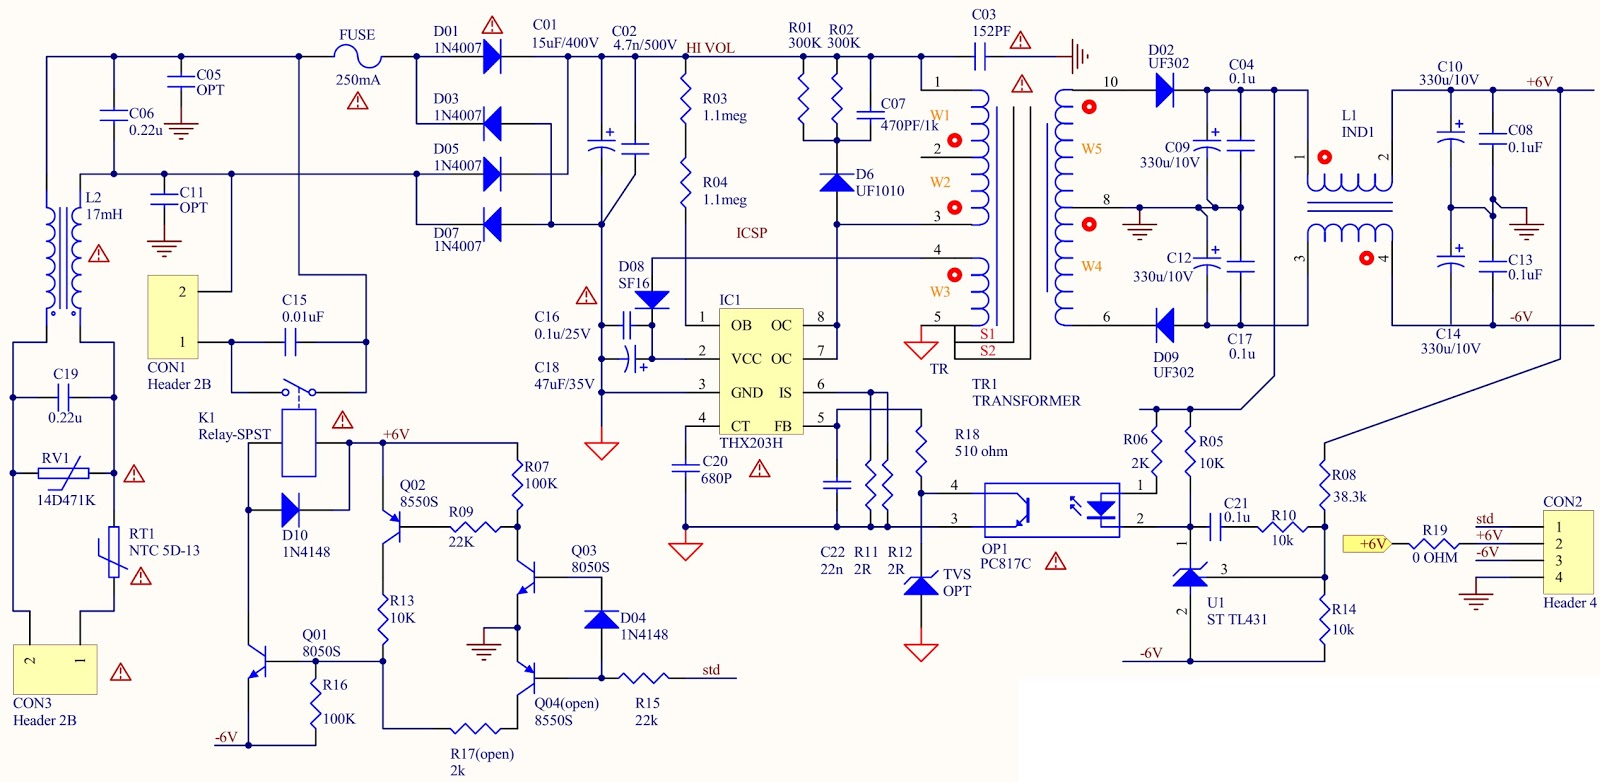 power bmp jbl sub150 jbl sub230 active sub woofer schematic circuit plasma cutter circuit [ 1600 x 782 Pixel ]